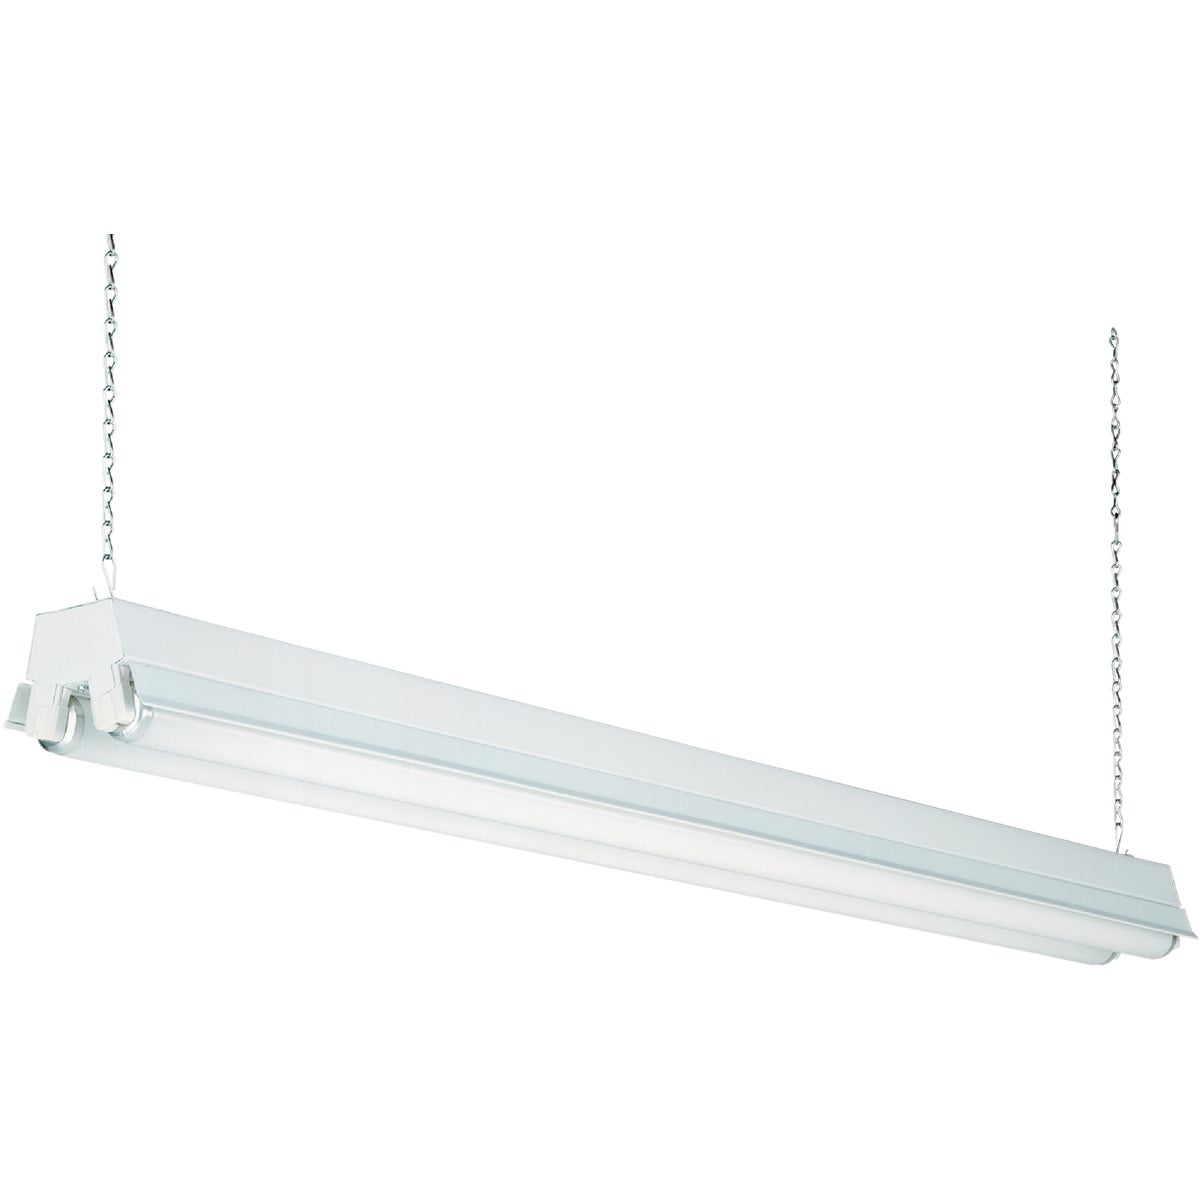 Lithonia Lighting 4' T12 2BULB SHOPLIGHT 1233